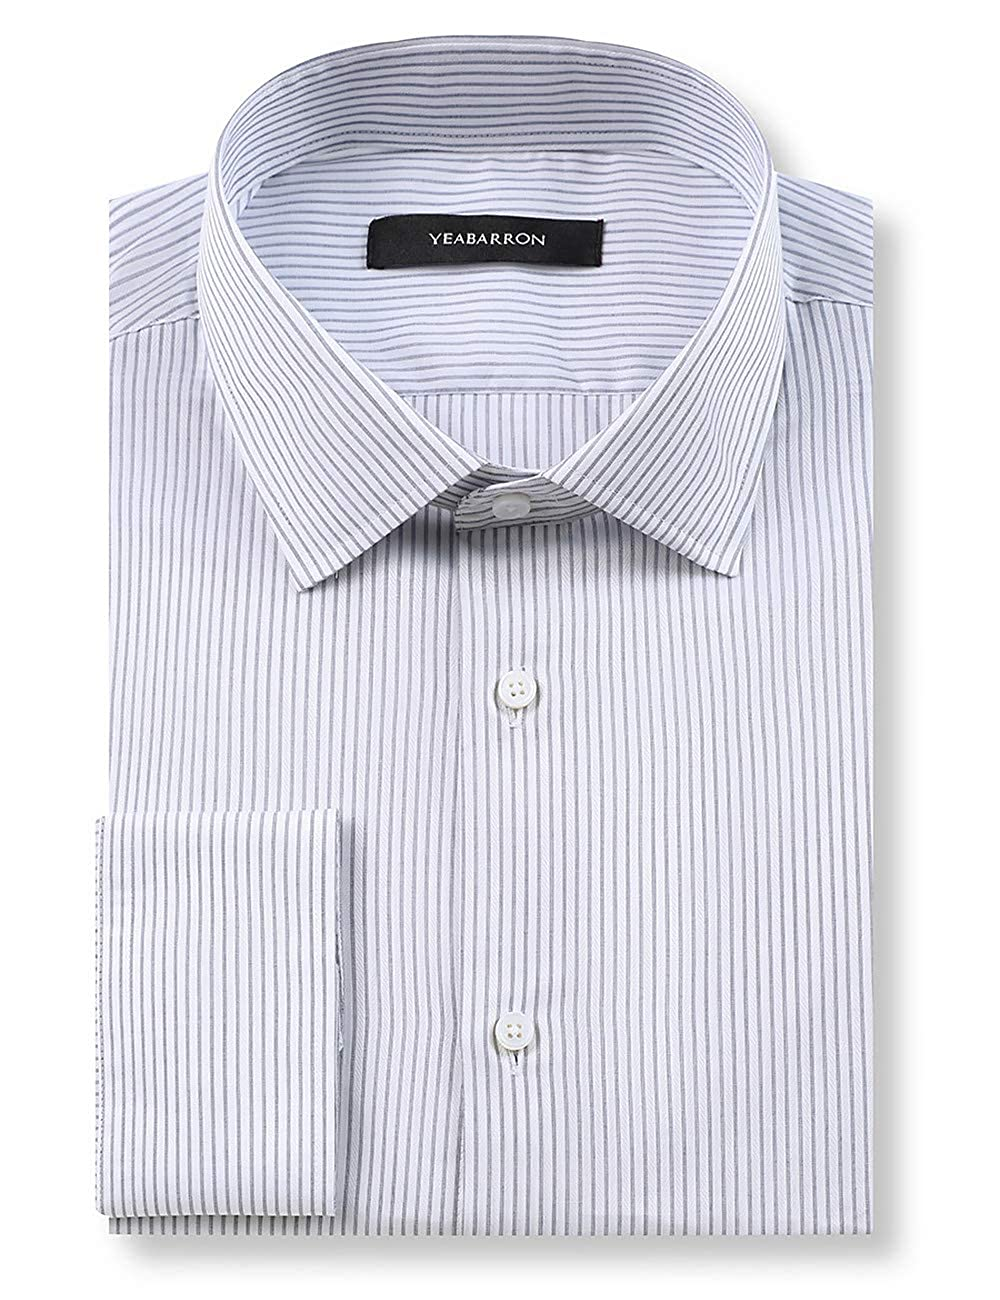 Amazon Yeabarron Custom Grey Stripe Slim Fit Long Sleeve